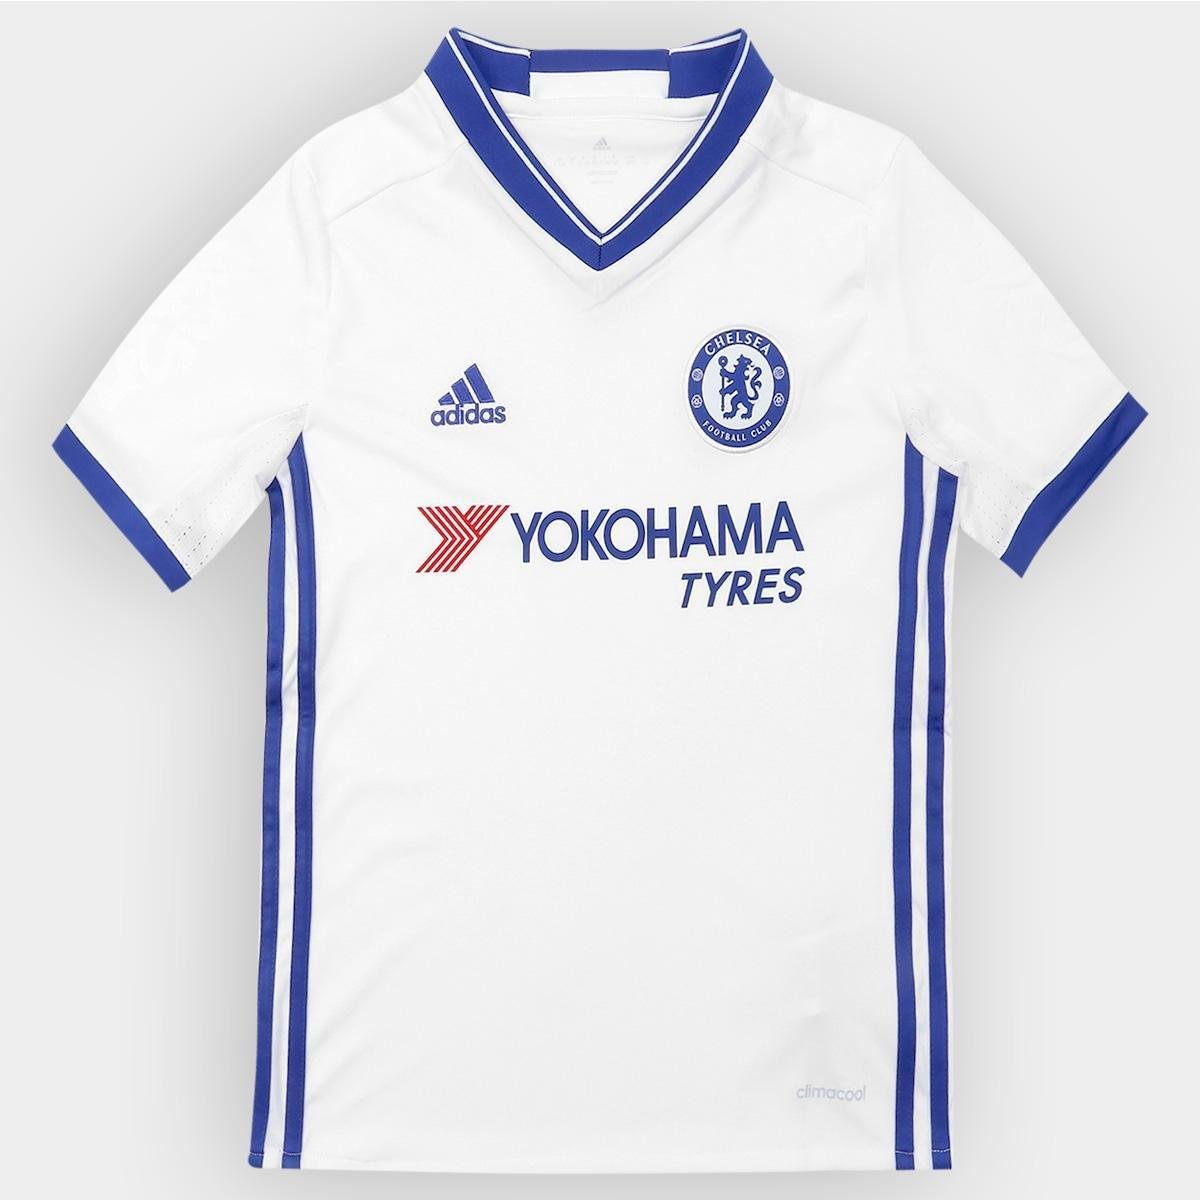 fd2d11711895f Camisa Chelsea Infantil Third 16 17 s nº - Torcedor Adidas - Compre Agora